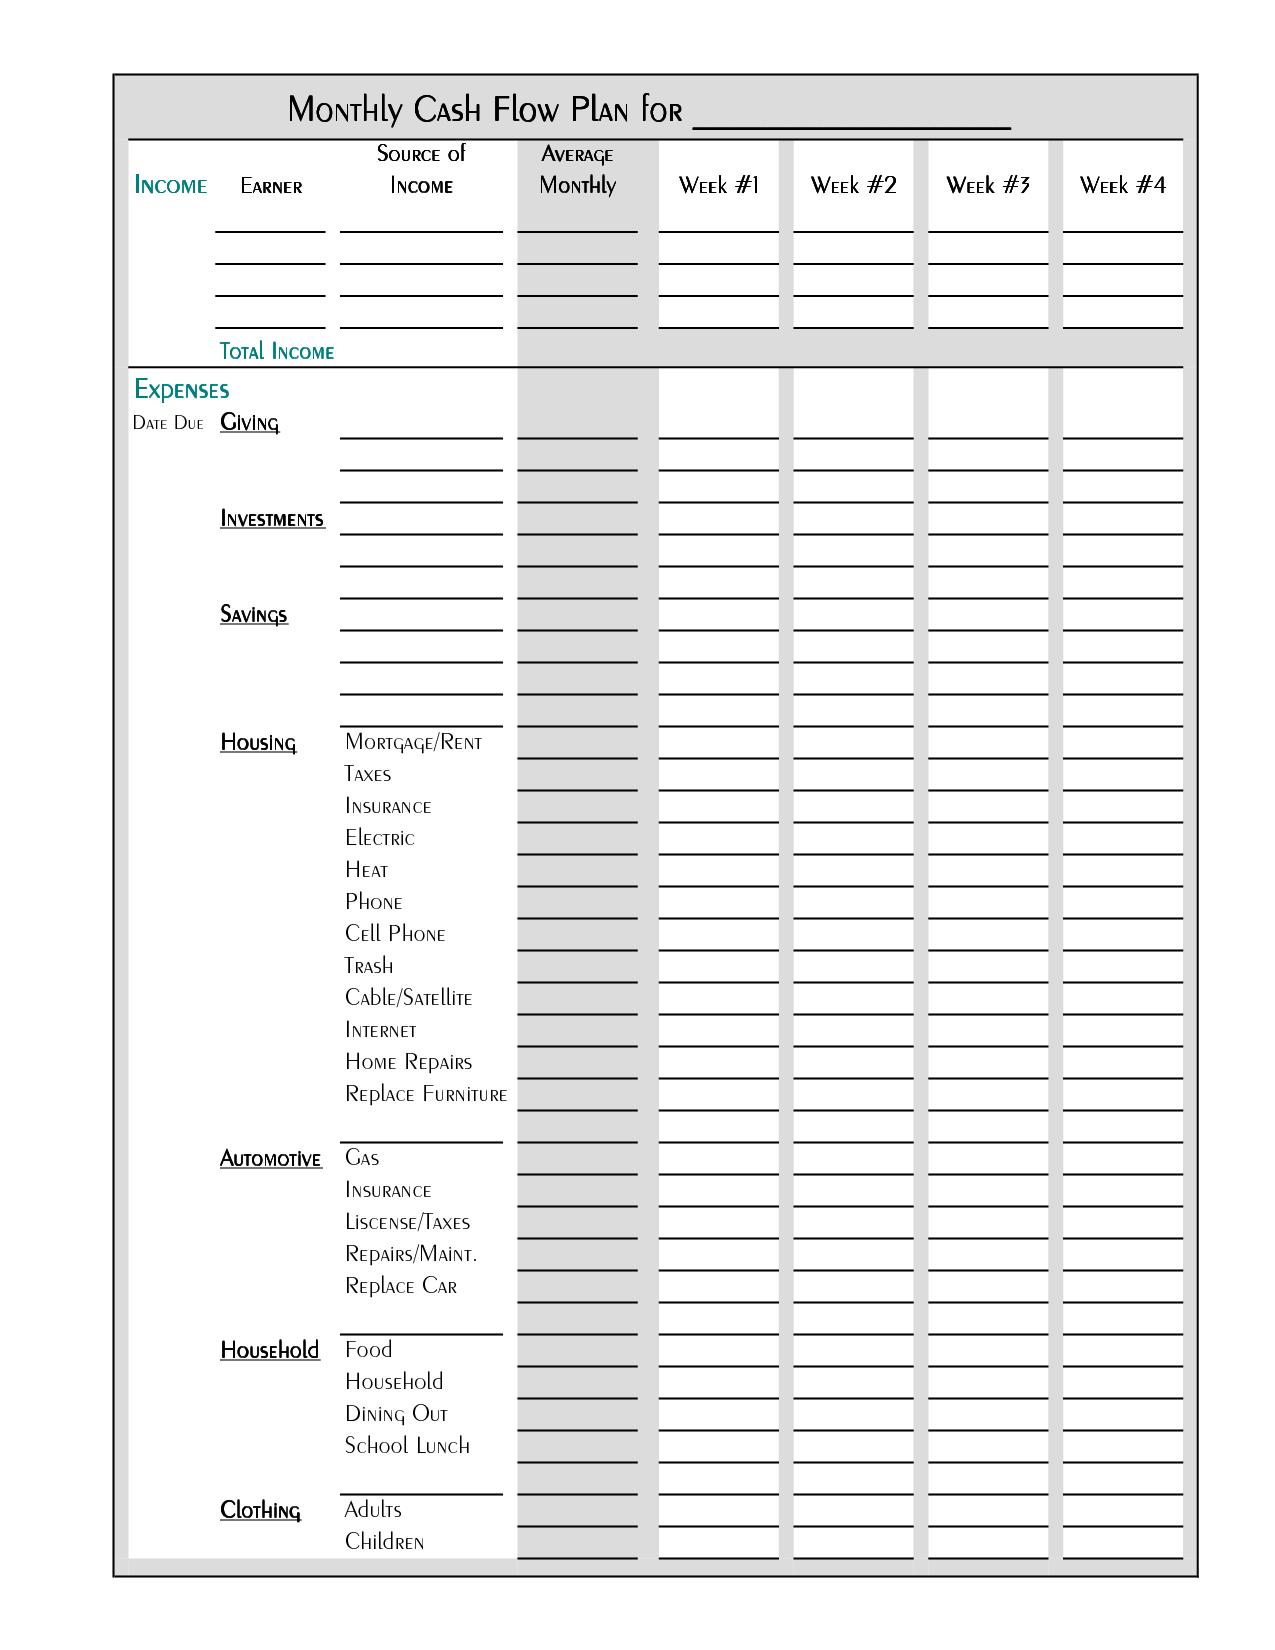 Sample Household Budget Worksheet and Free Printable Bud Worksheet Template Tips Ideas